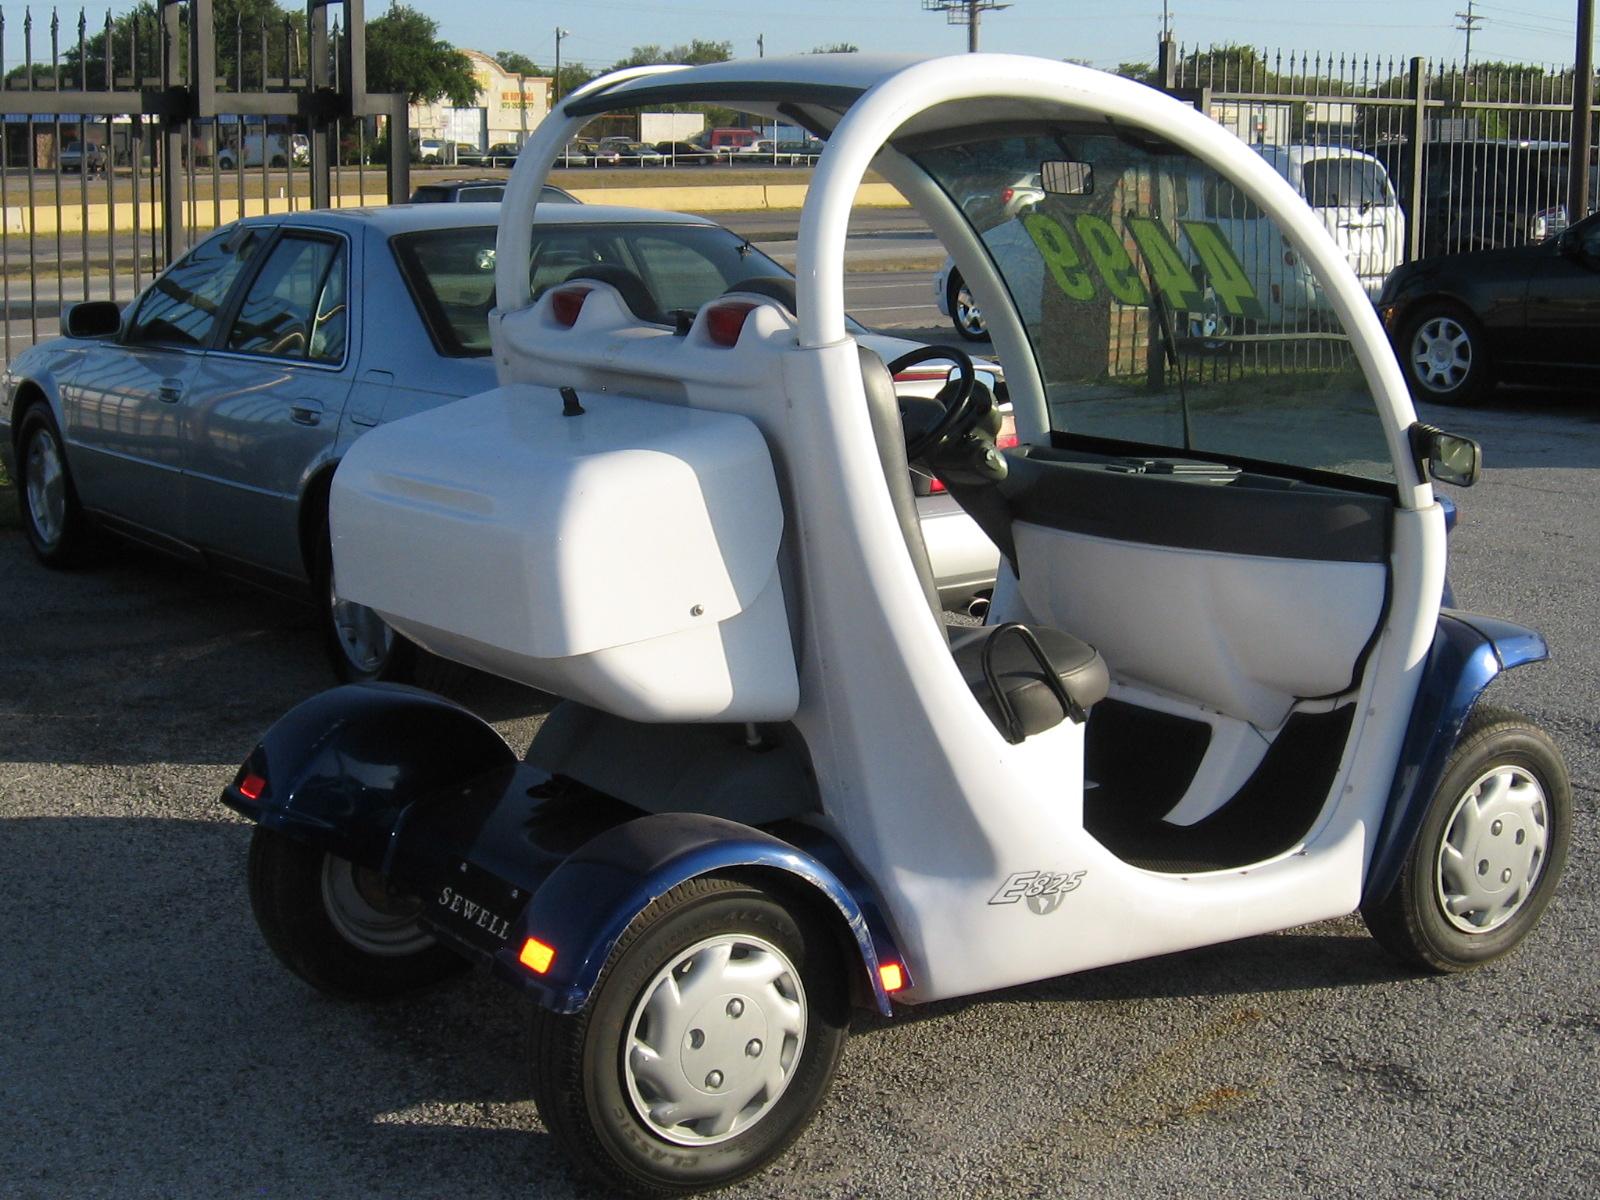 2000 GEM CAR   Welcome to Autoworldtx